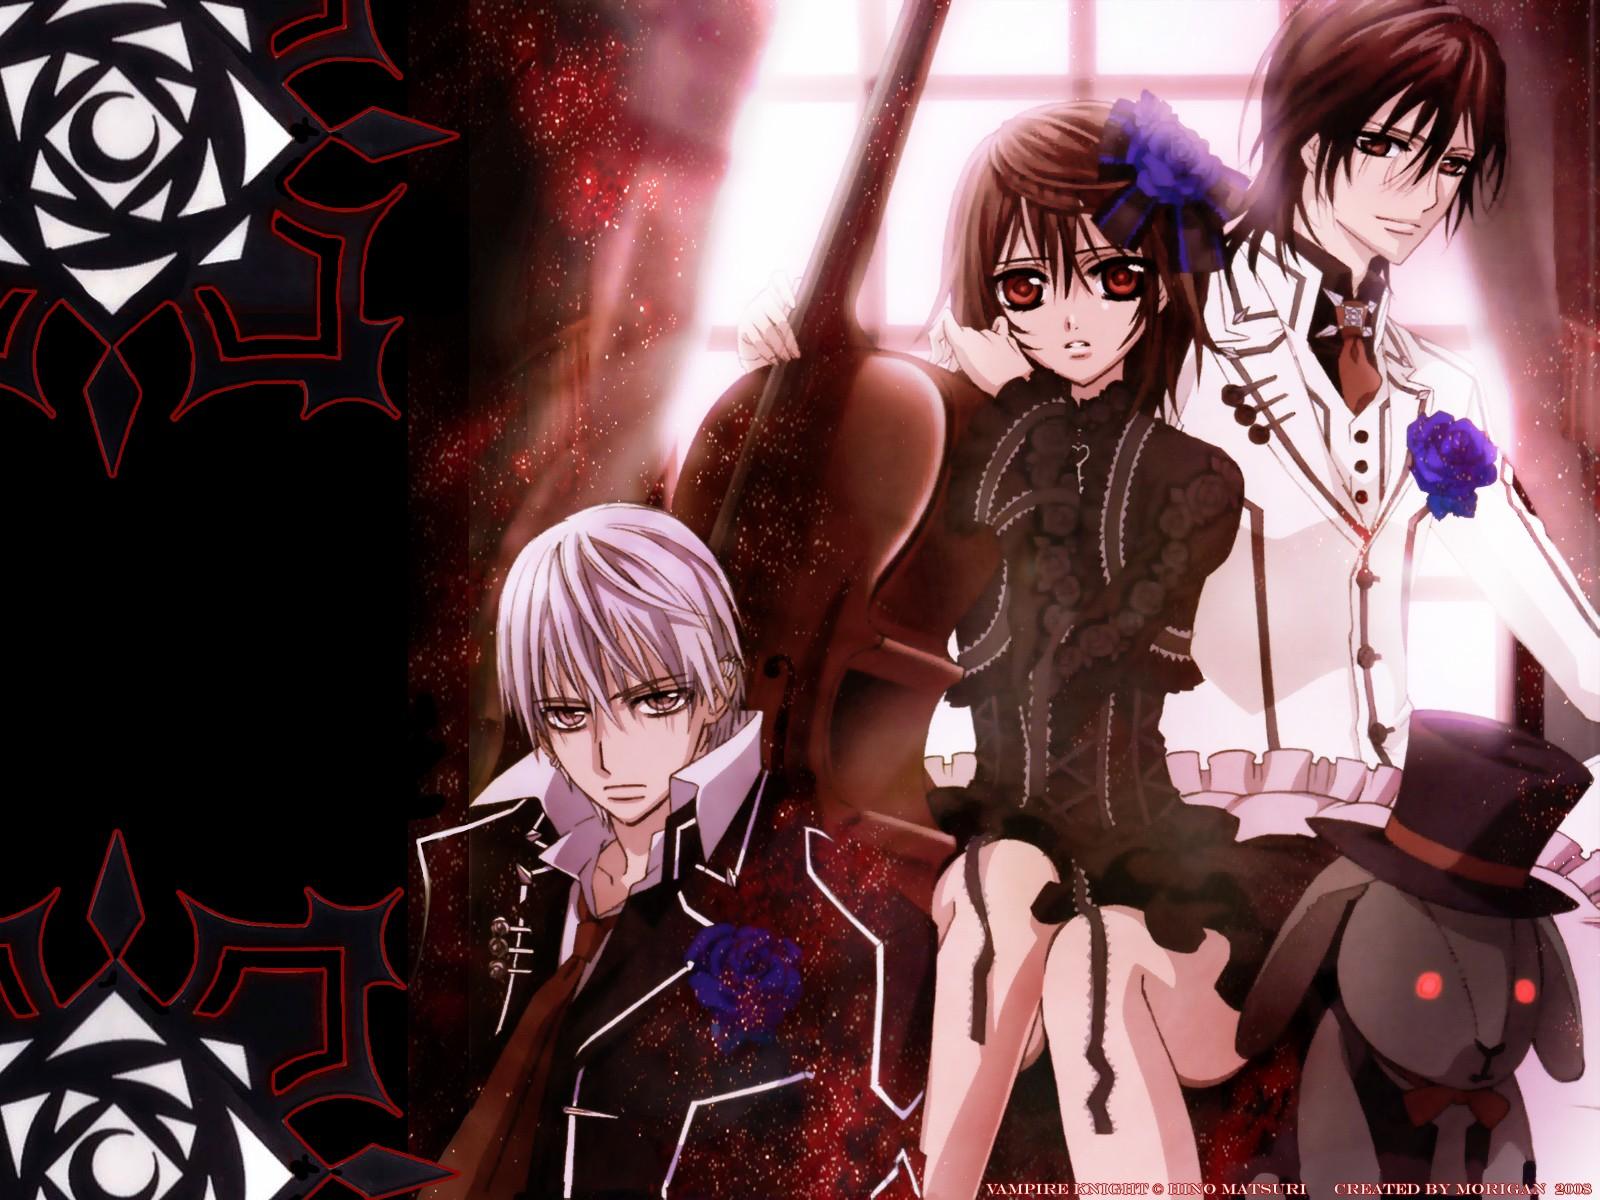 http://1.bp.blogspot.com/-TNQsNVy2qOE/T-bx38ZeoVI/AAAAAAAAATk/7X2YHS7DDnQ/s1600/vampire_knight_anime_yuki_cross_kuran_kaname_zero_kiryu_desktop_1600x1200_wallpaper-251628.jpg